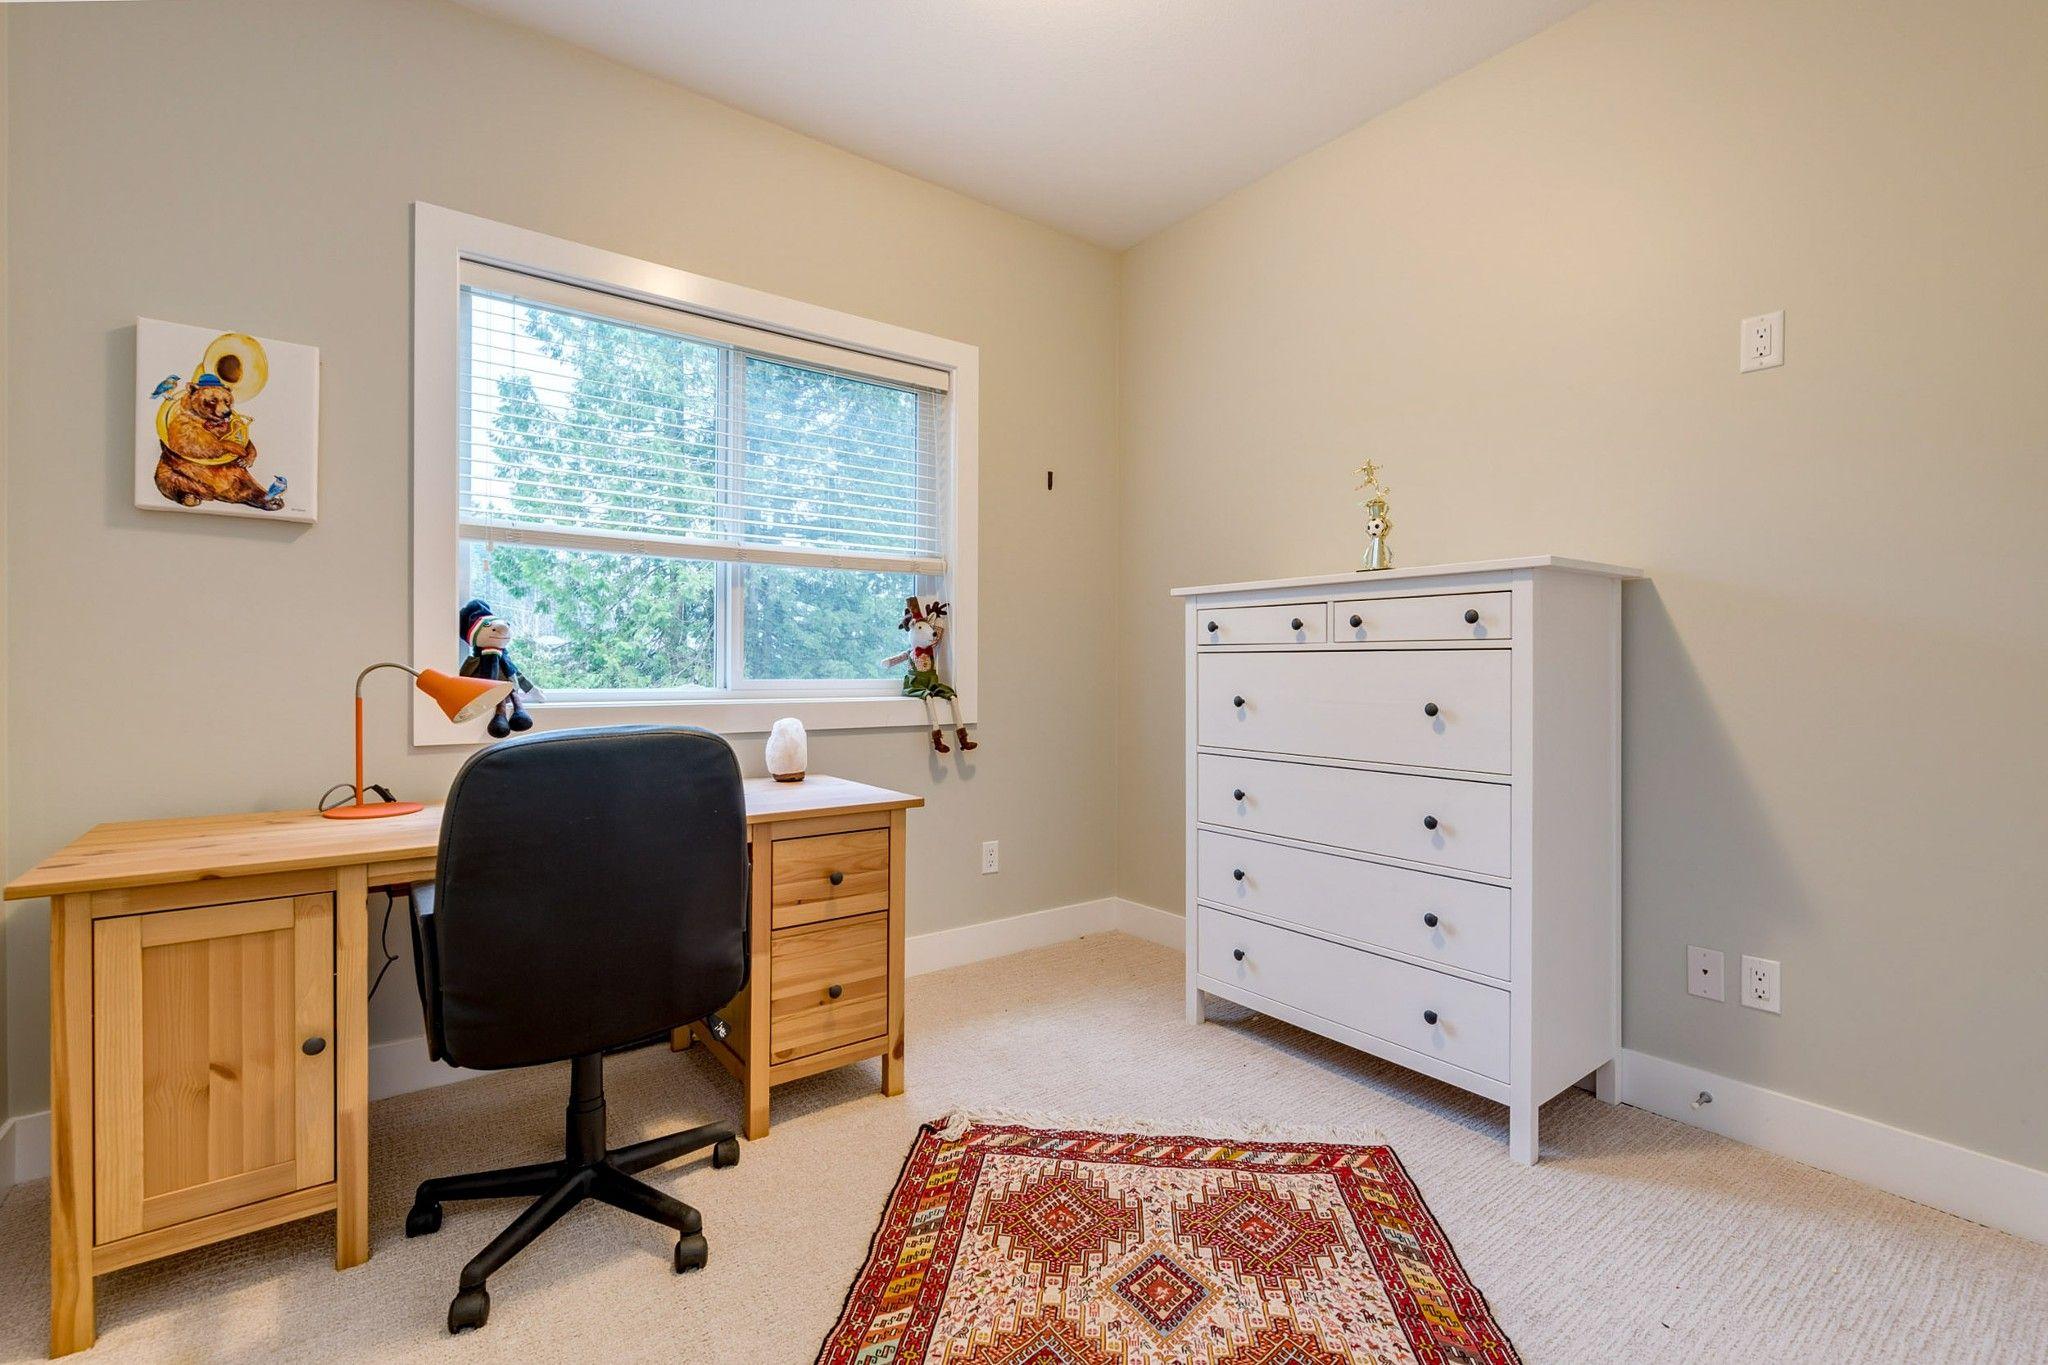 Photo 16: Photos: 1303 Hollybrook Street in Coquitlam: Burke Mountain House for sale : MLS®# R2423196